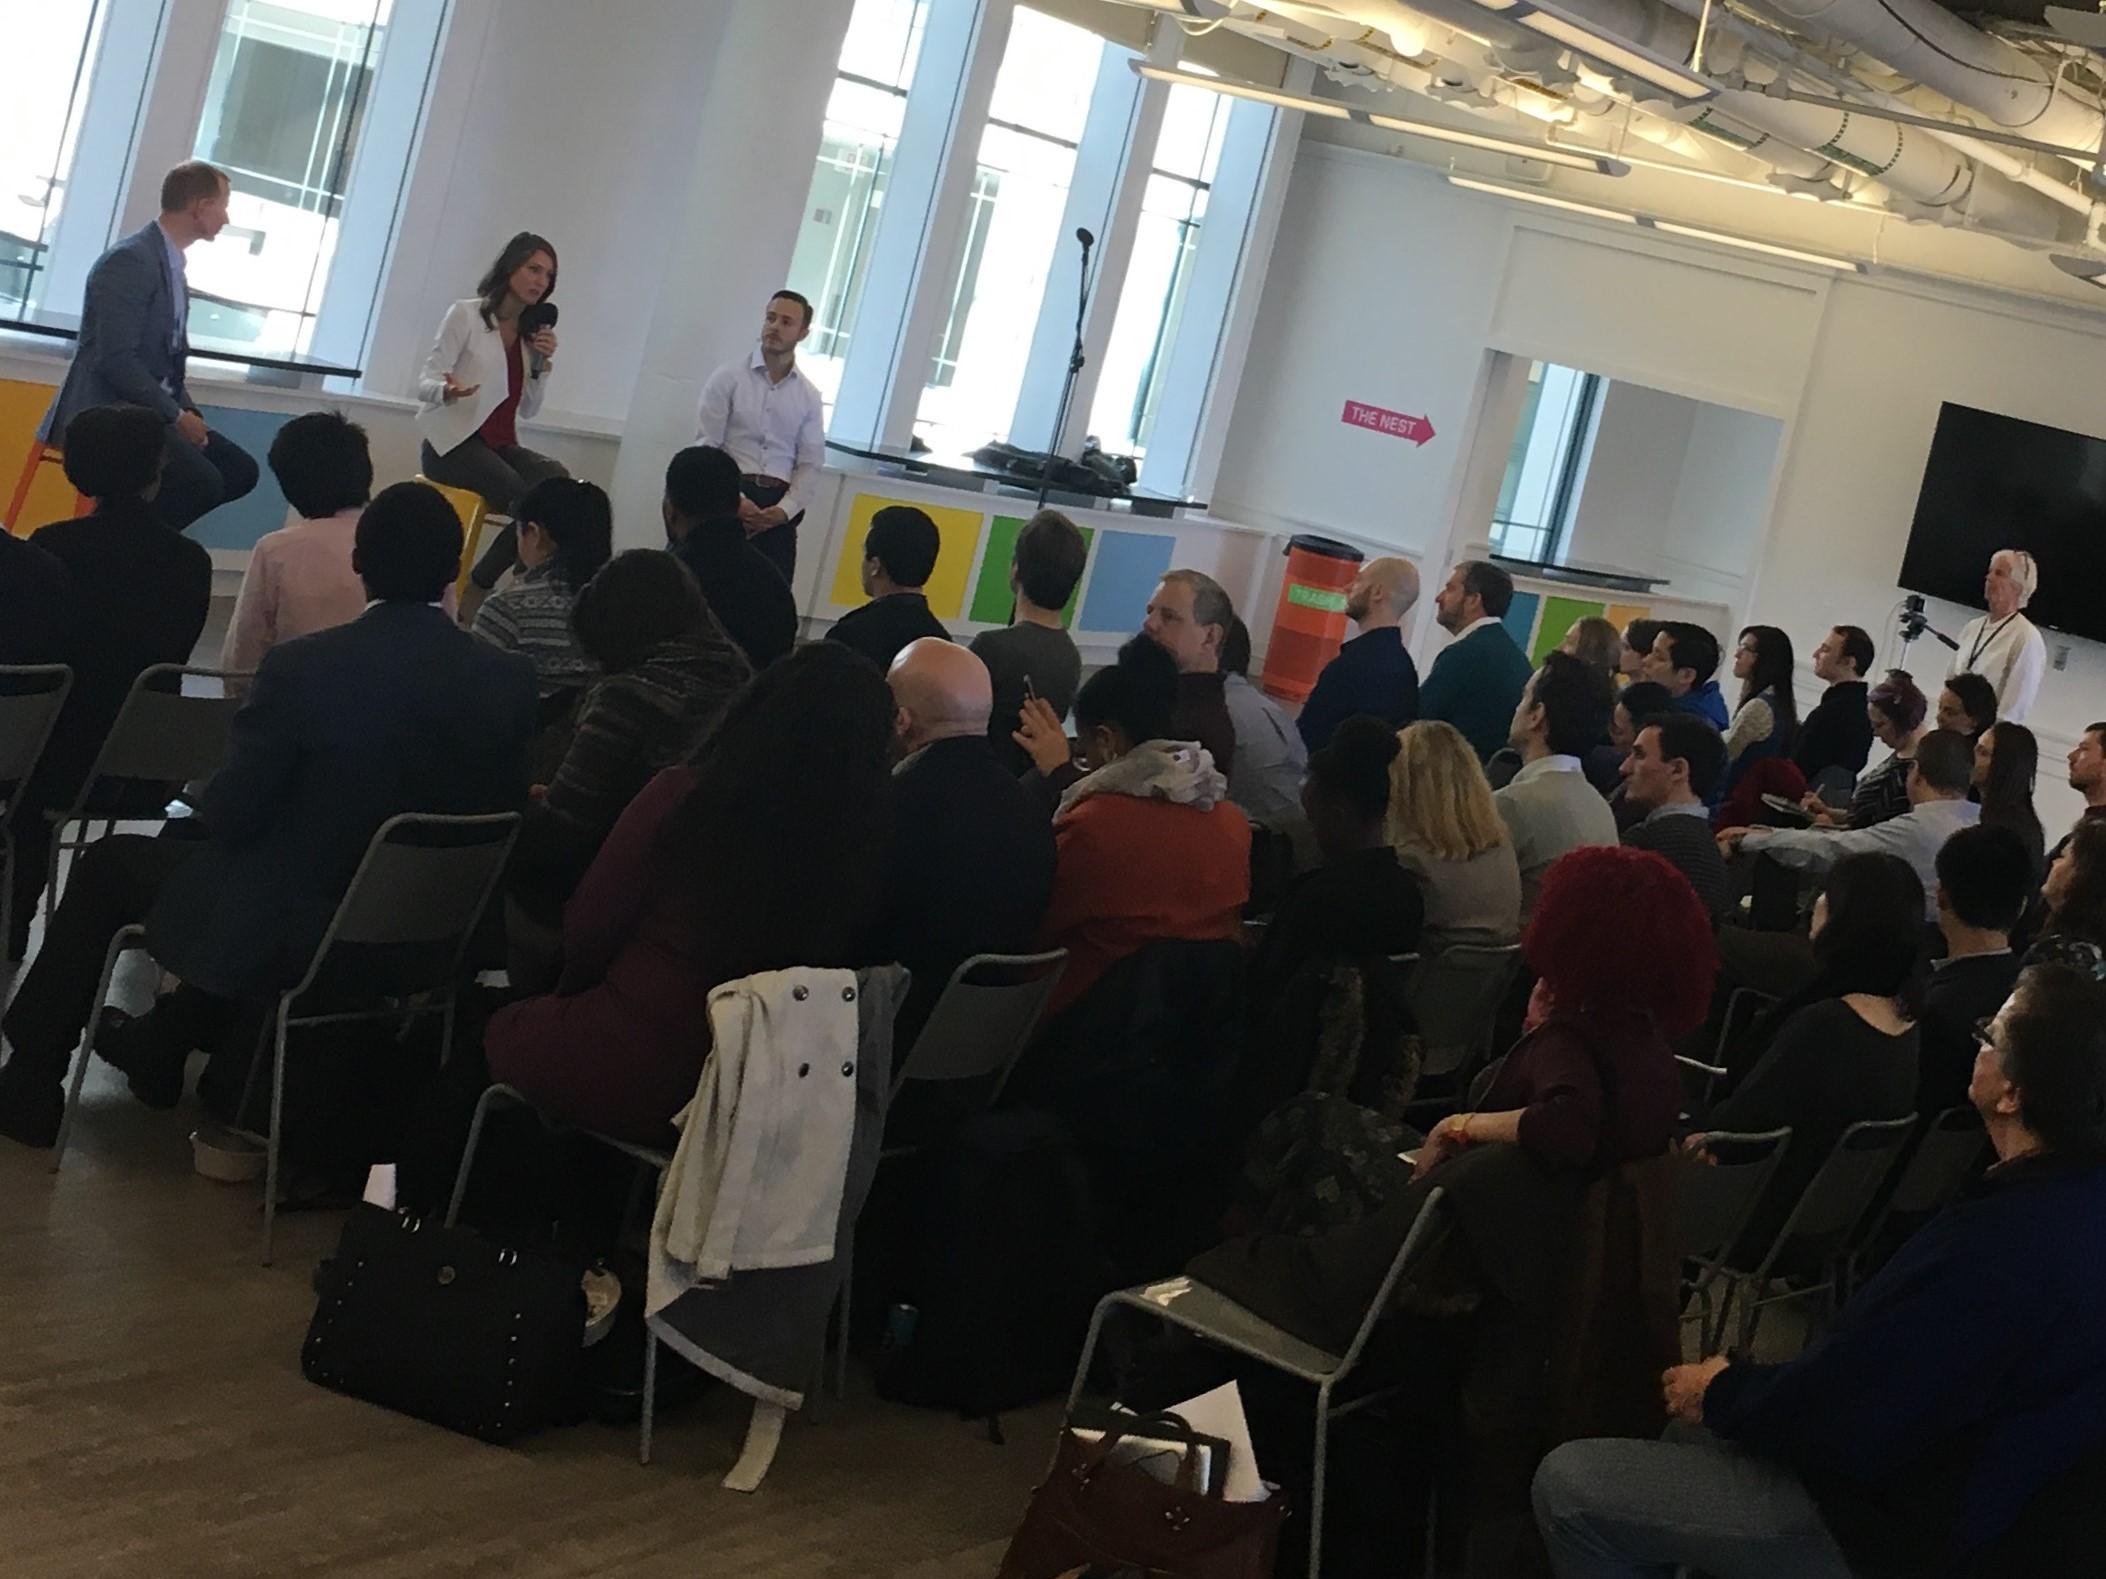 BostonSpeaksSeries Event